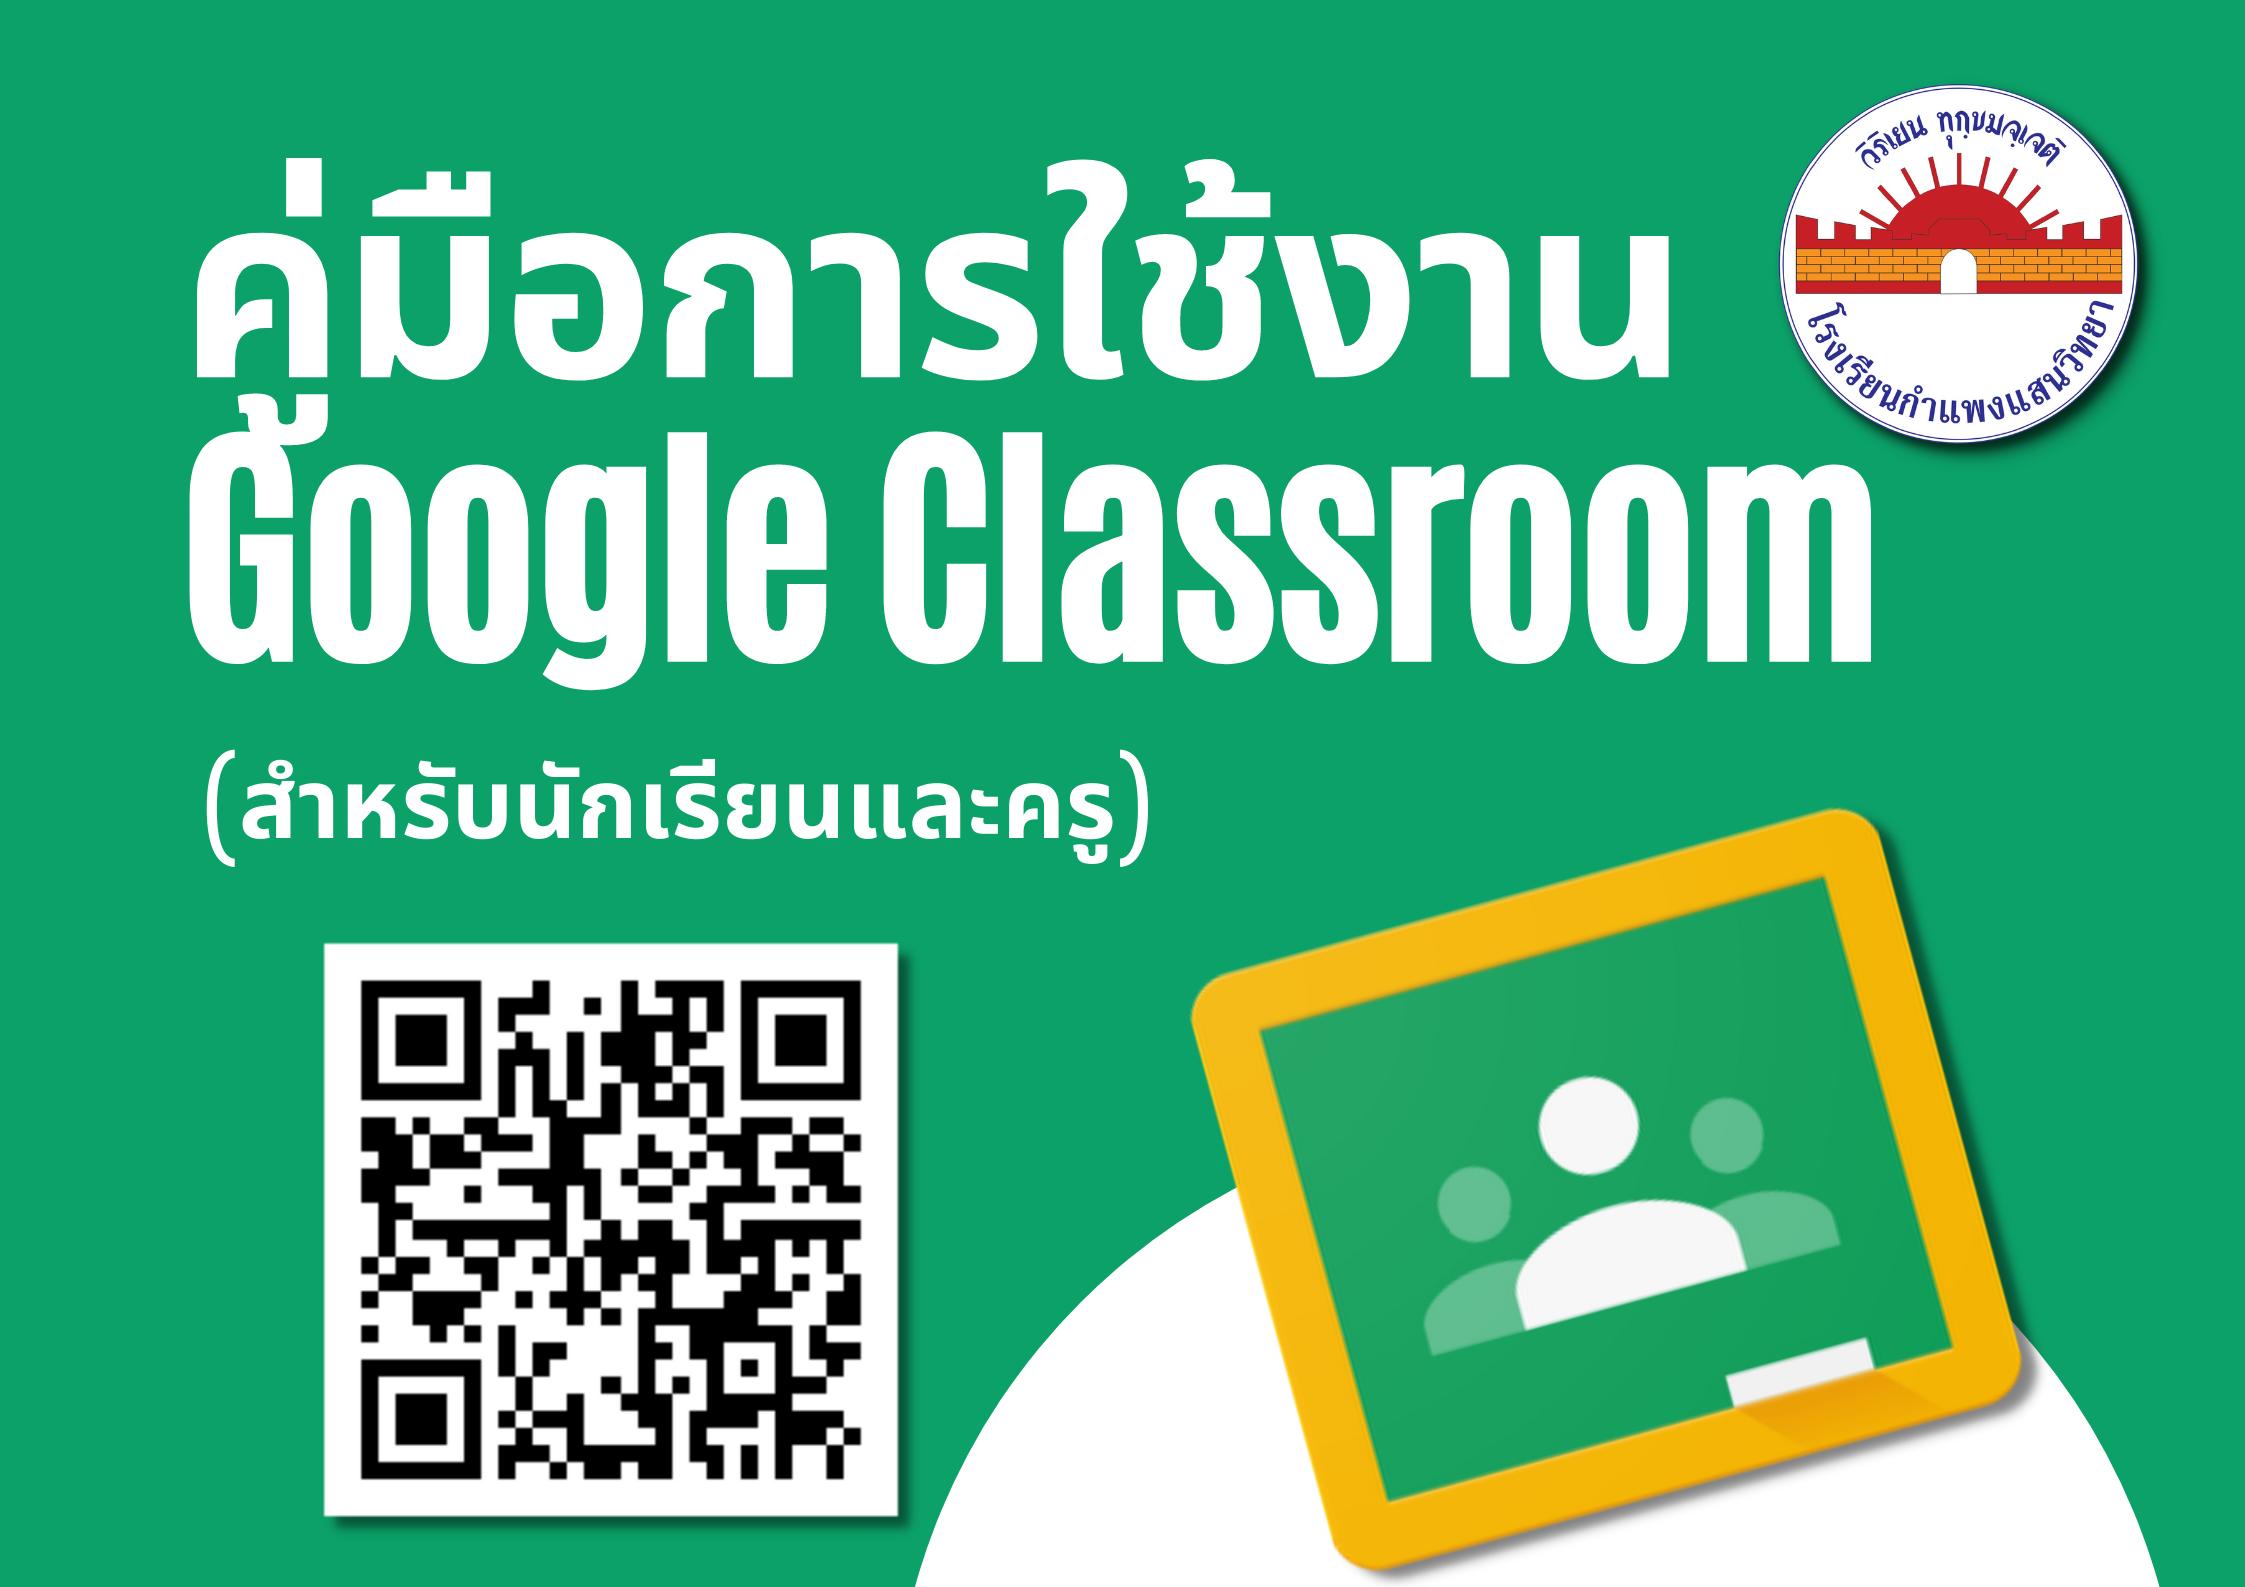 https://support.google.com/edu/classroom/